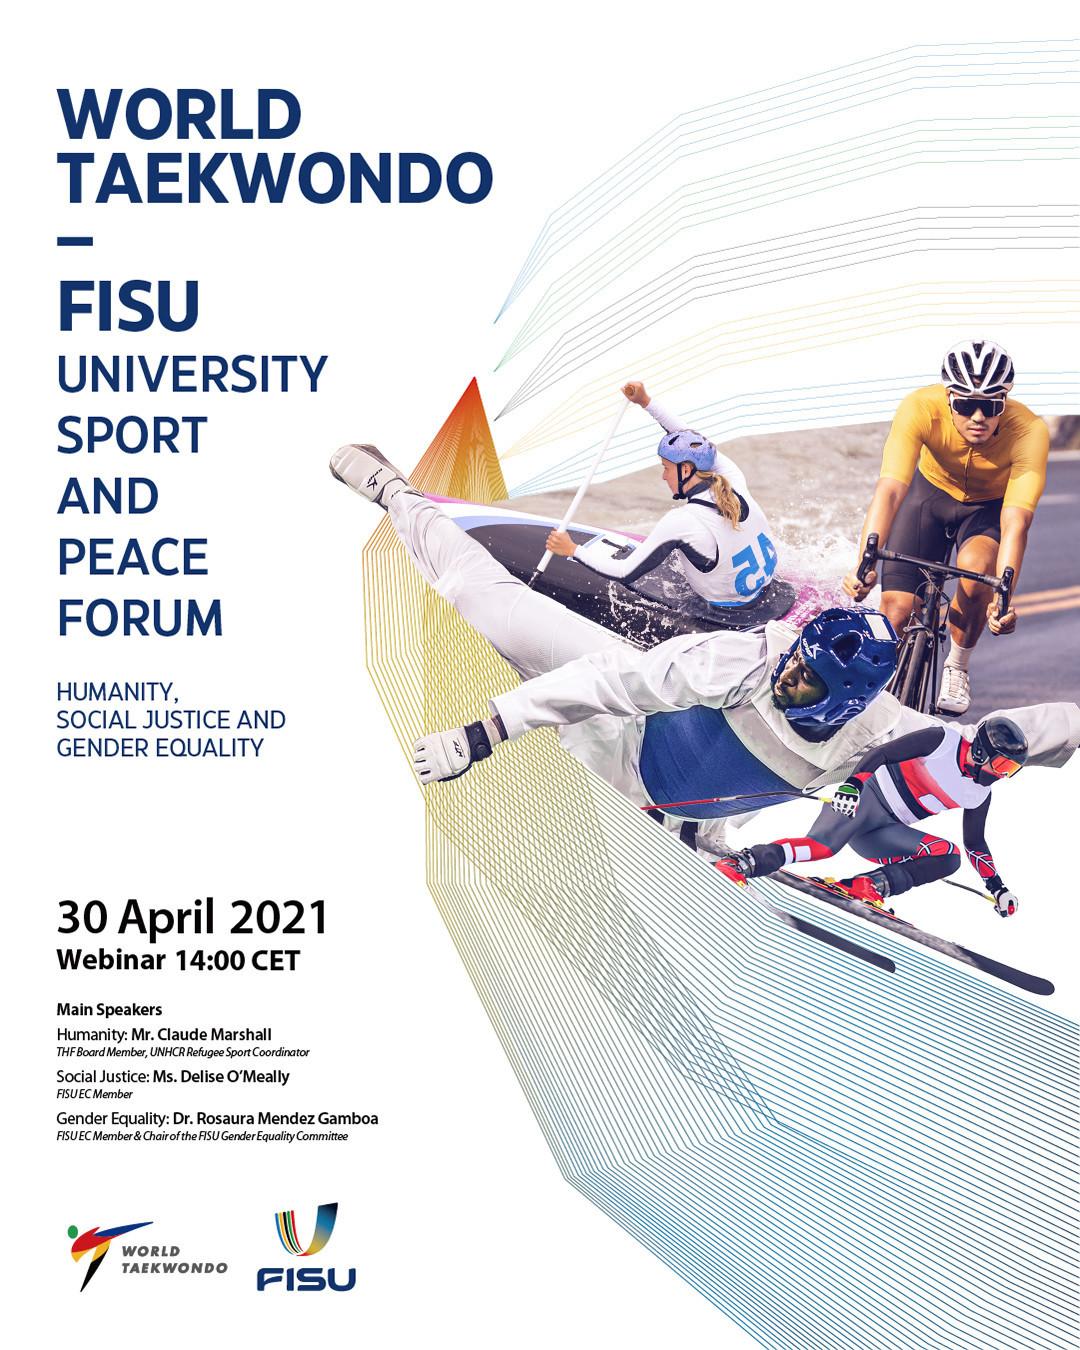 World Taekwondo and FISU to stage University Sport and Peace Forum